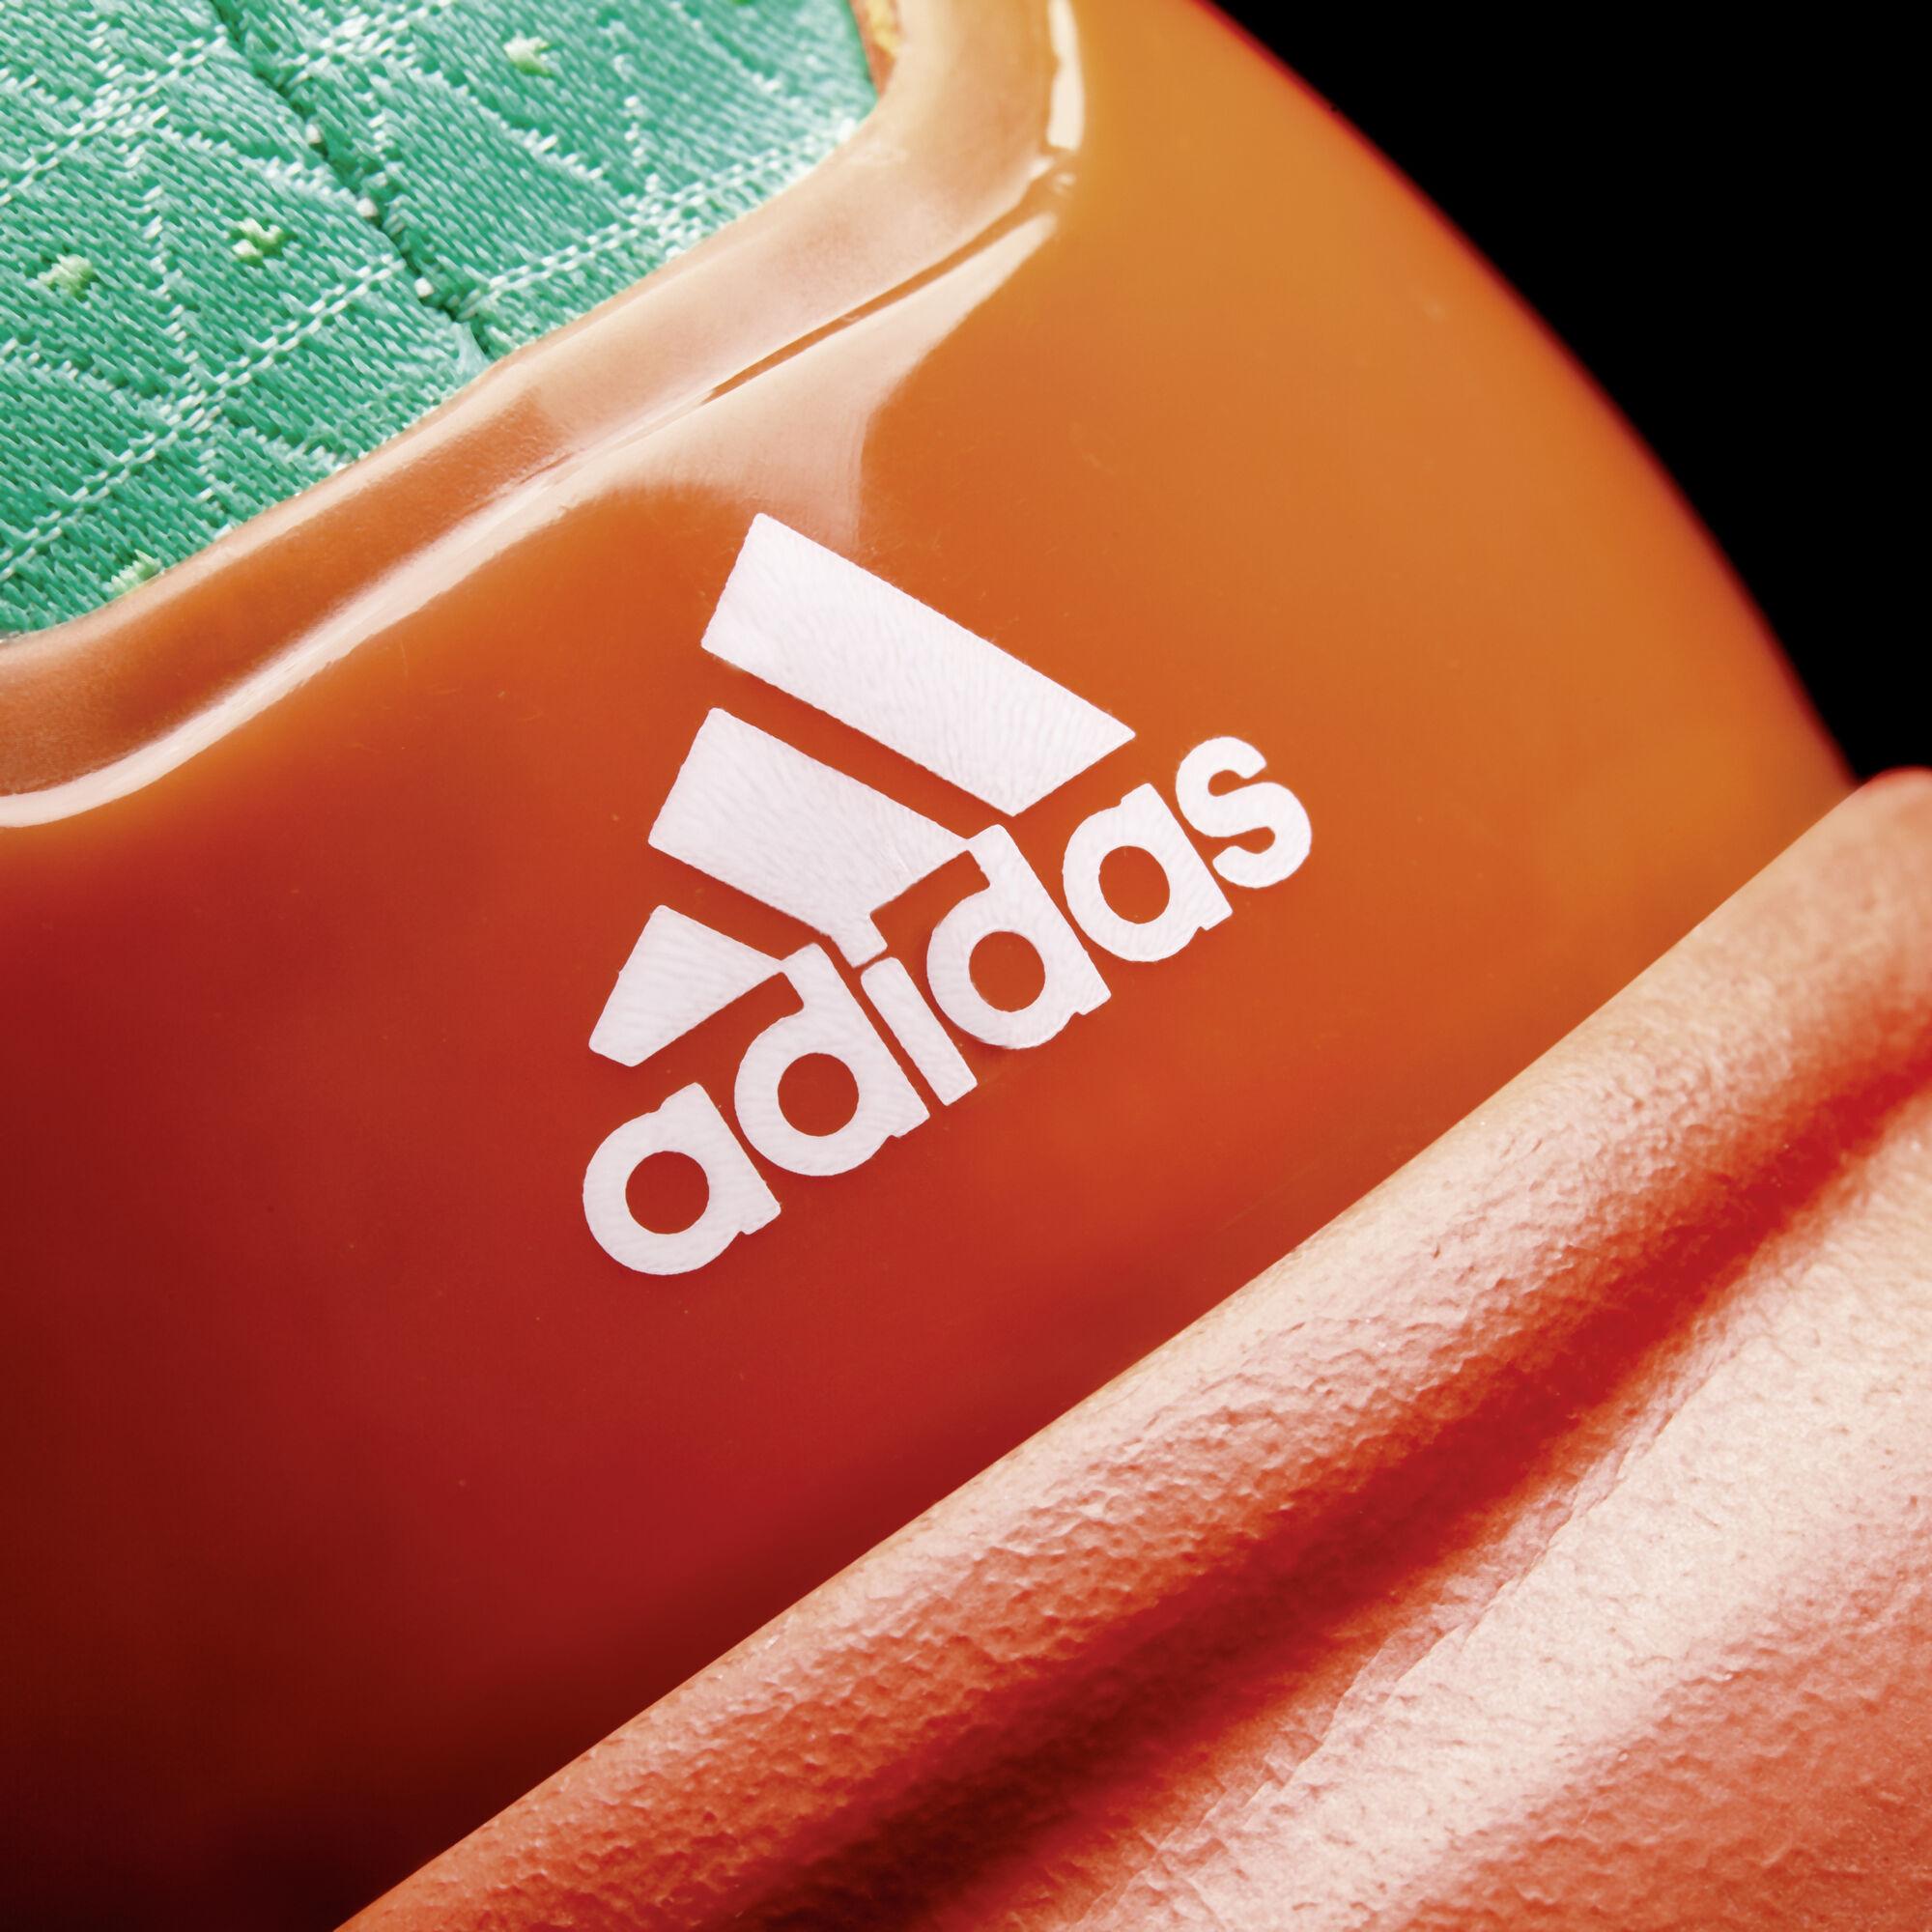 dd99e831b426d8 adidas Angelique Kerber Adizero Ubersonic 2 Clay Sandplatzschuh ...